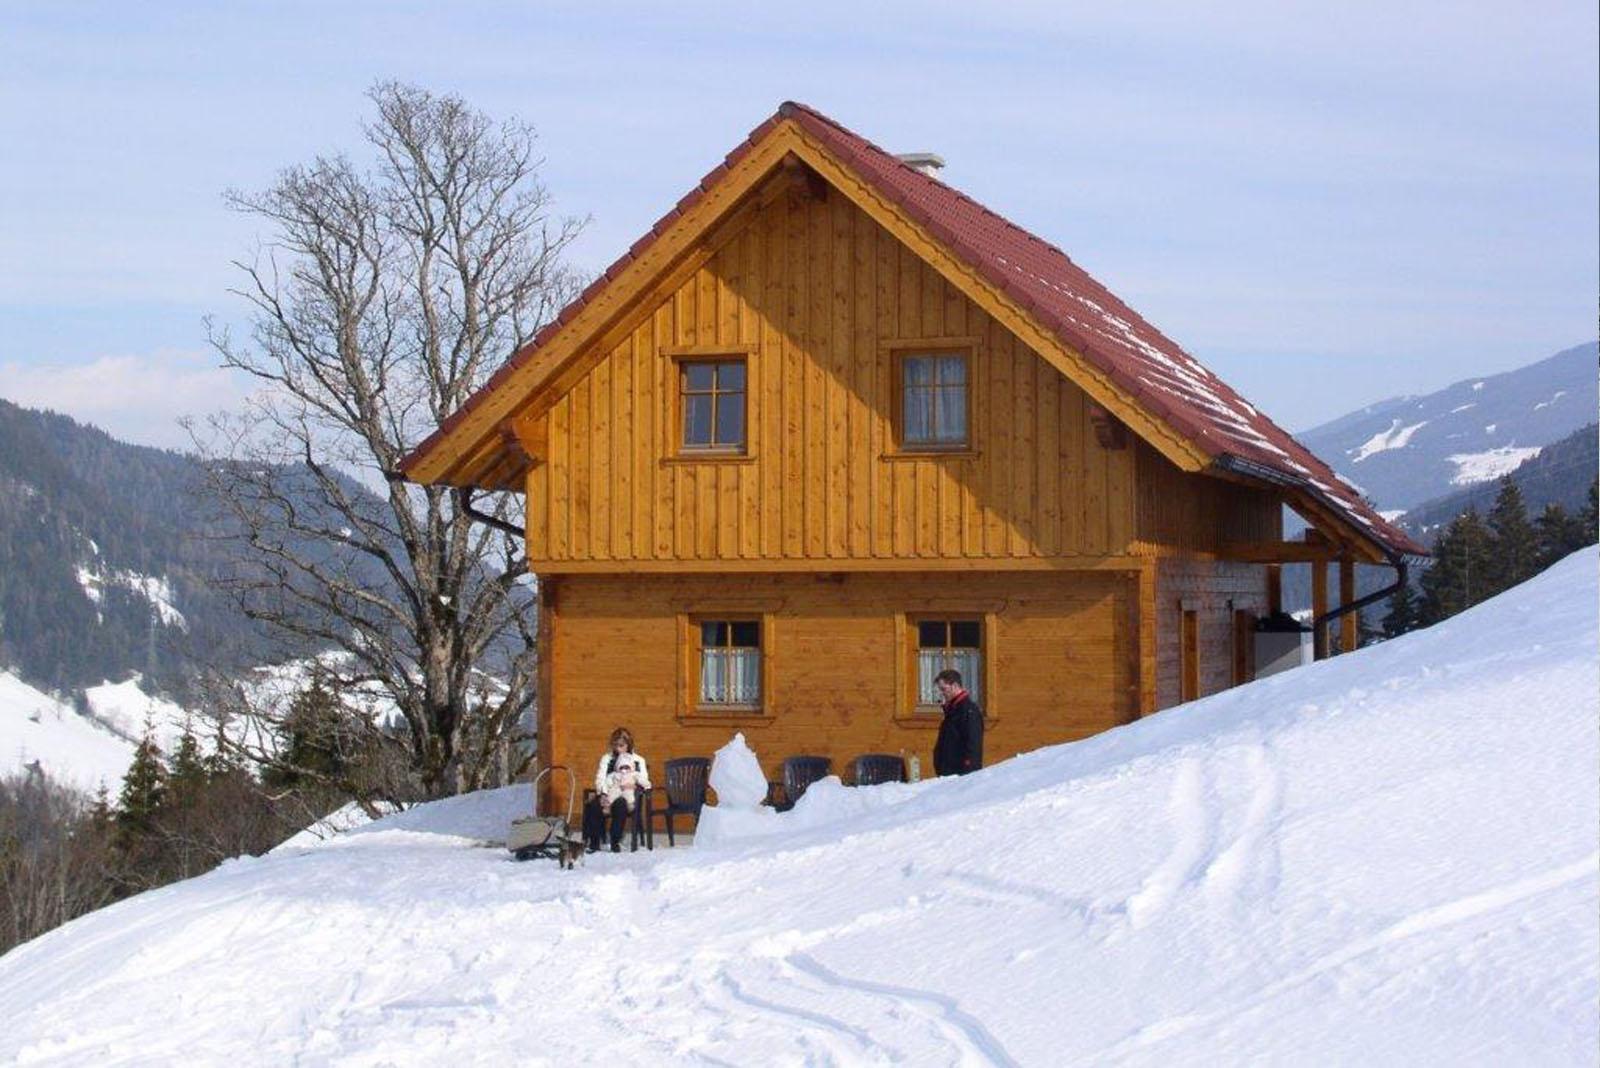 Reiteralm - Winter - Urlaub - Gleiming